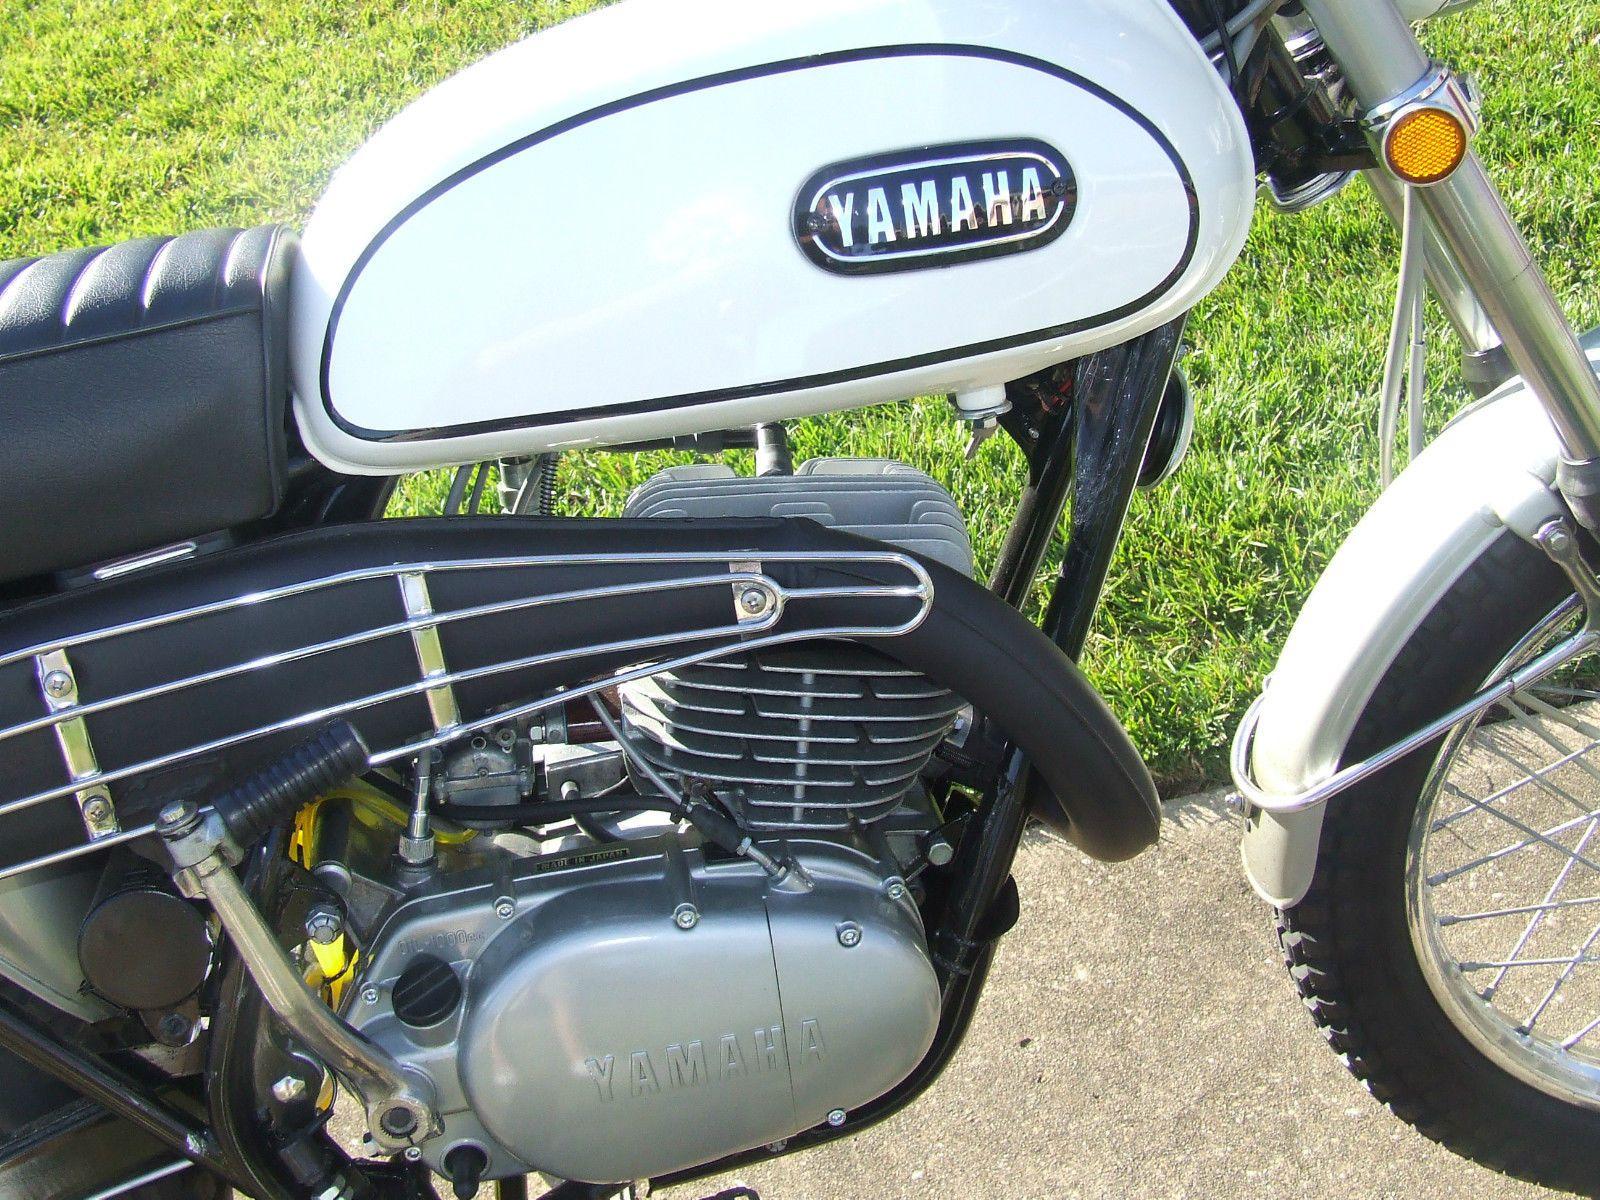 1968 Yamaha DT1 | eBay